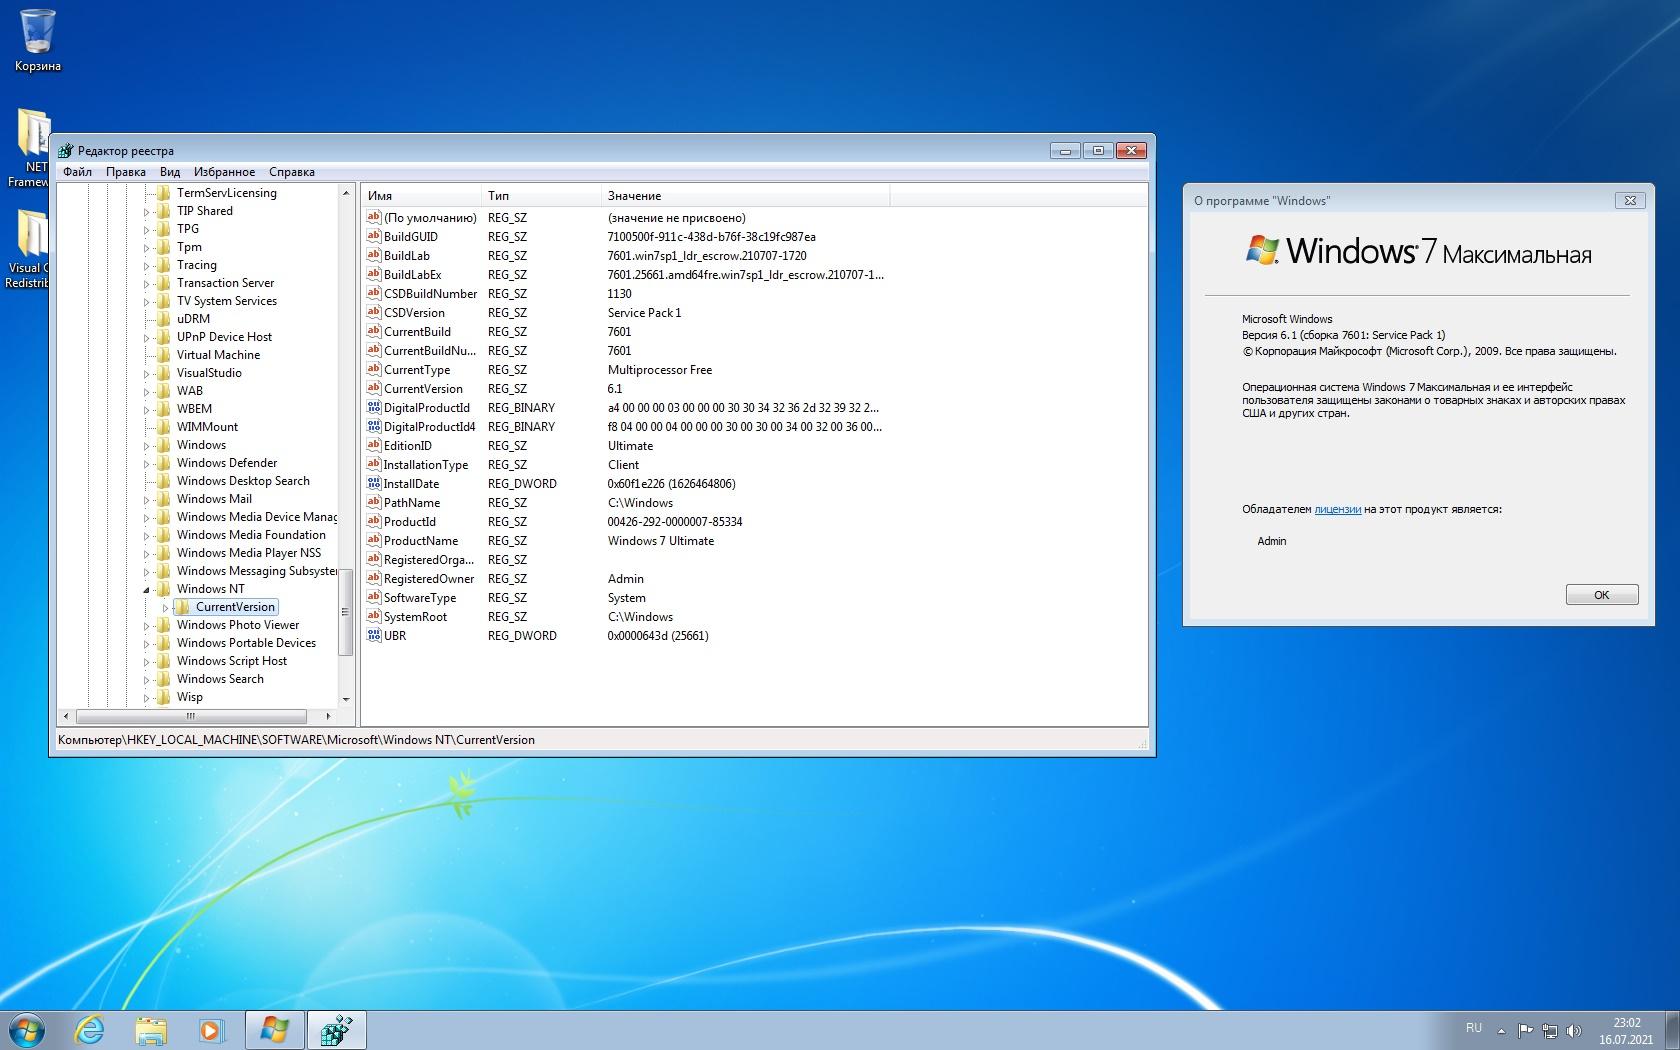 Windows 7 SP1 6.1 (Build 7601.25661) (13in2) x86/x64 by Sergei Strelec